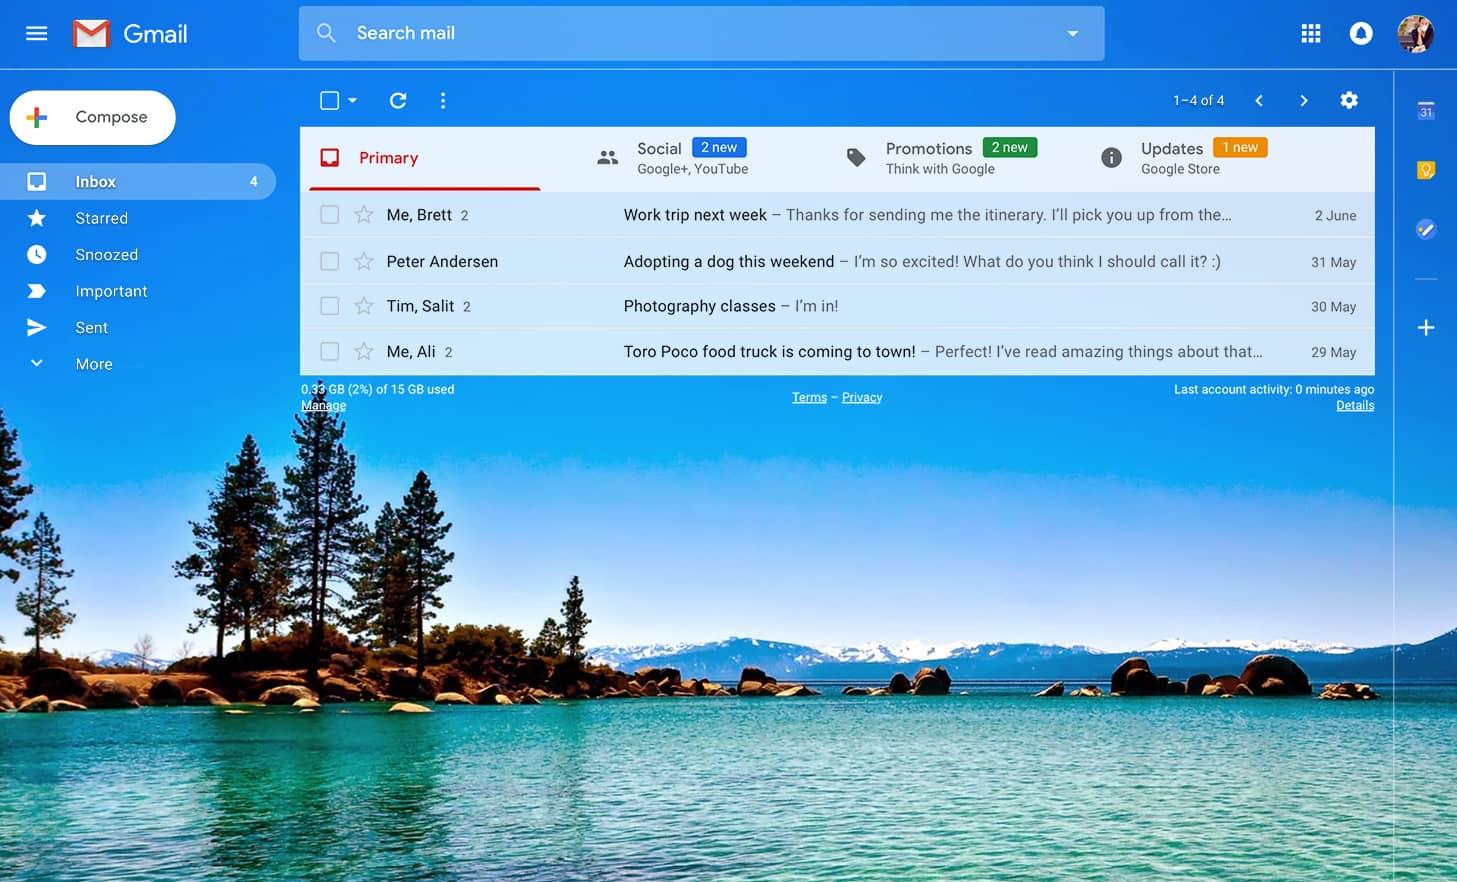 Gmail theme image size - Custom Themes Custom Themes Custom Themes Custom Themes